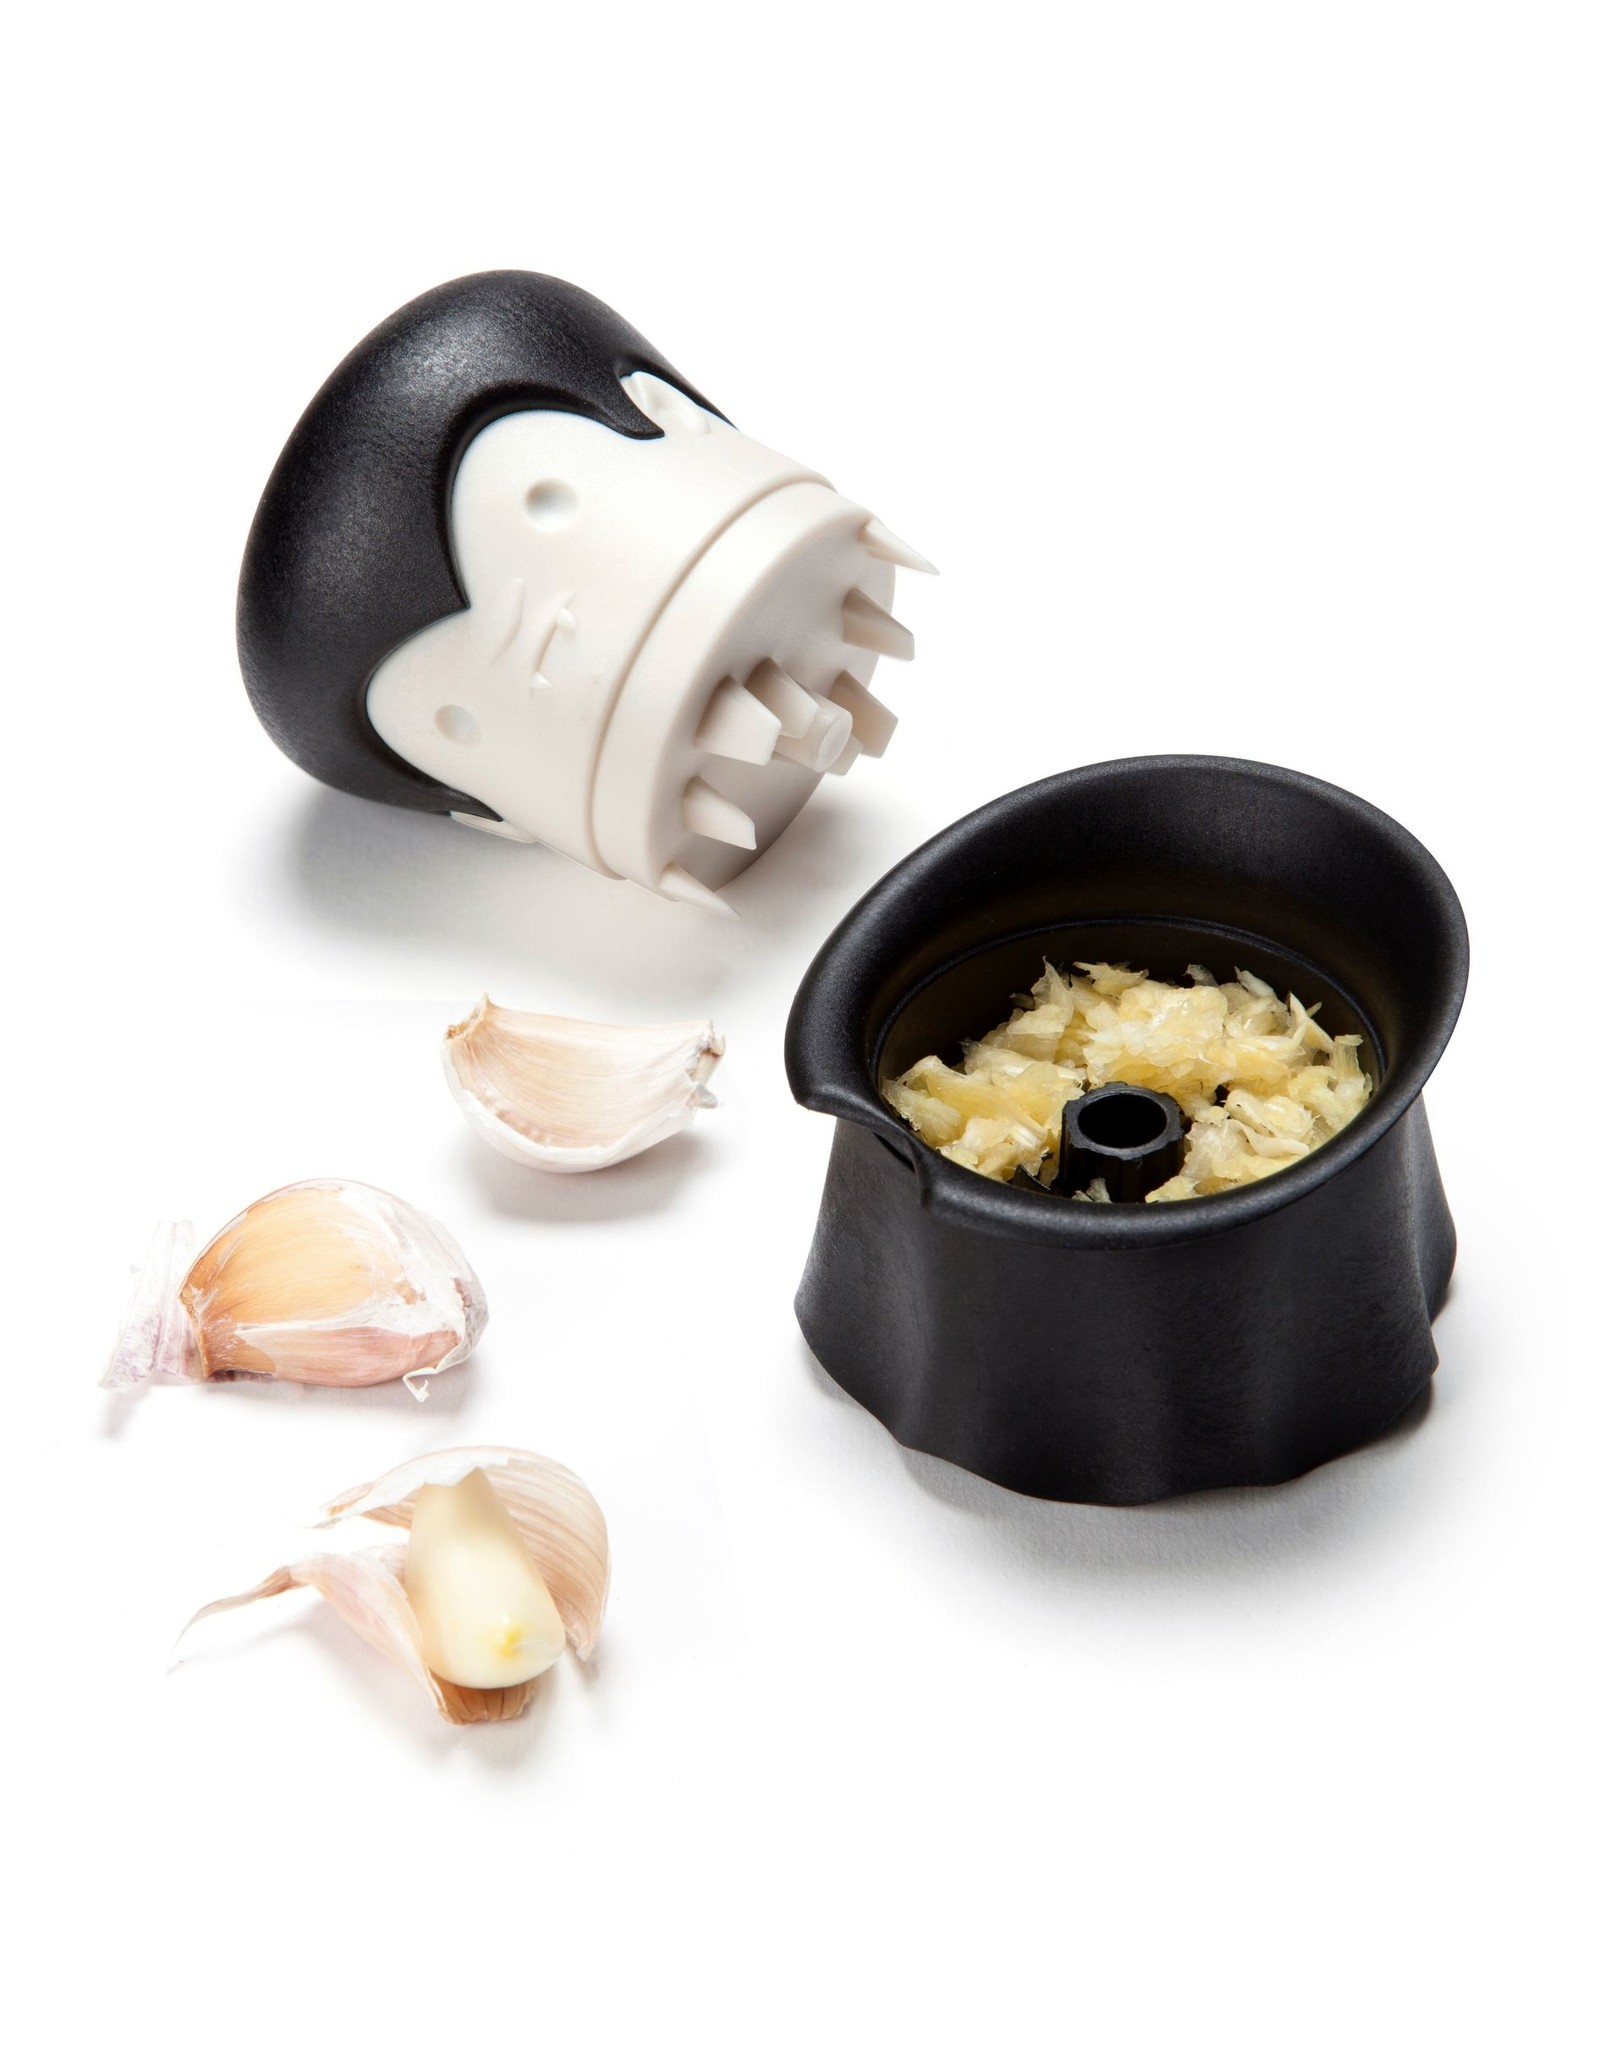 Ototo garlic press in the shape of a vampire